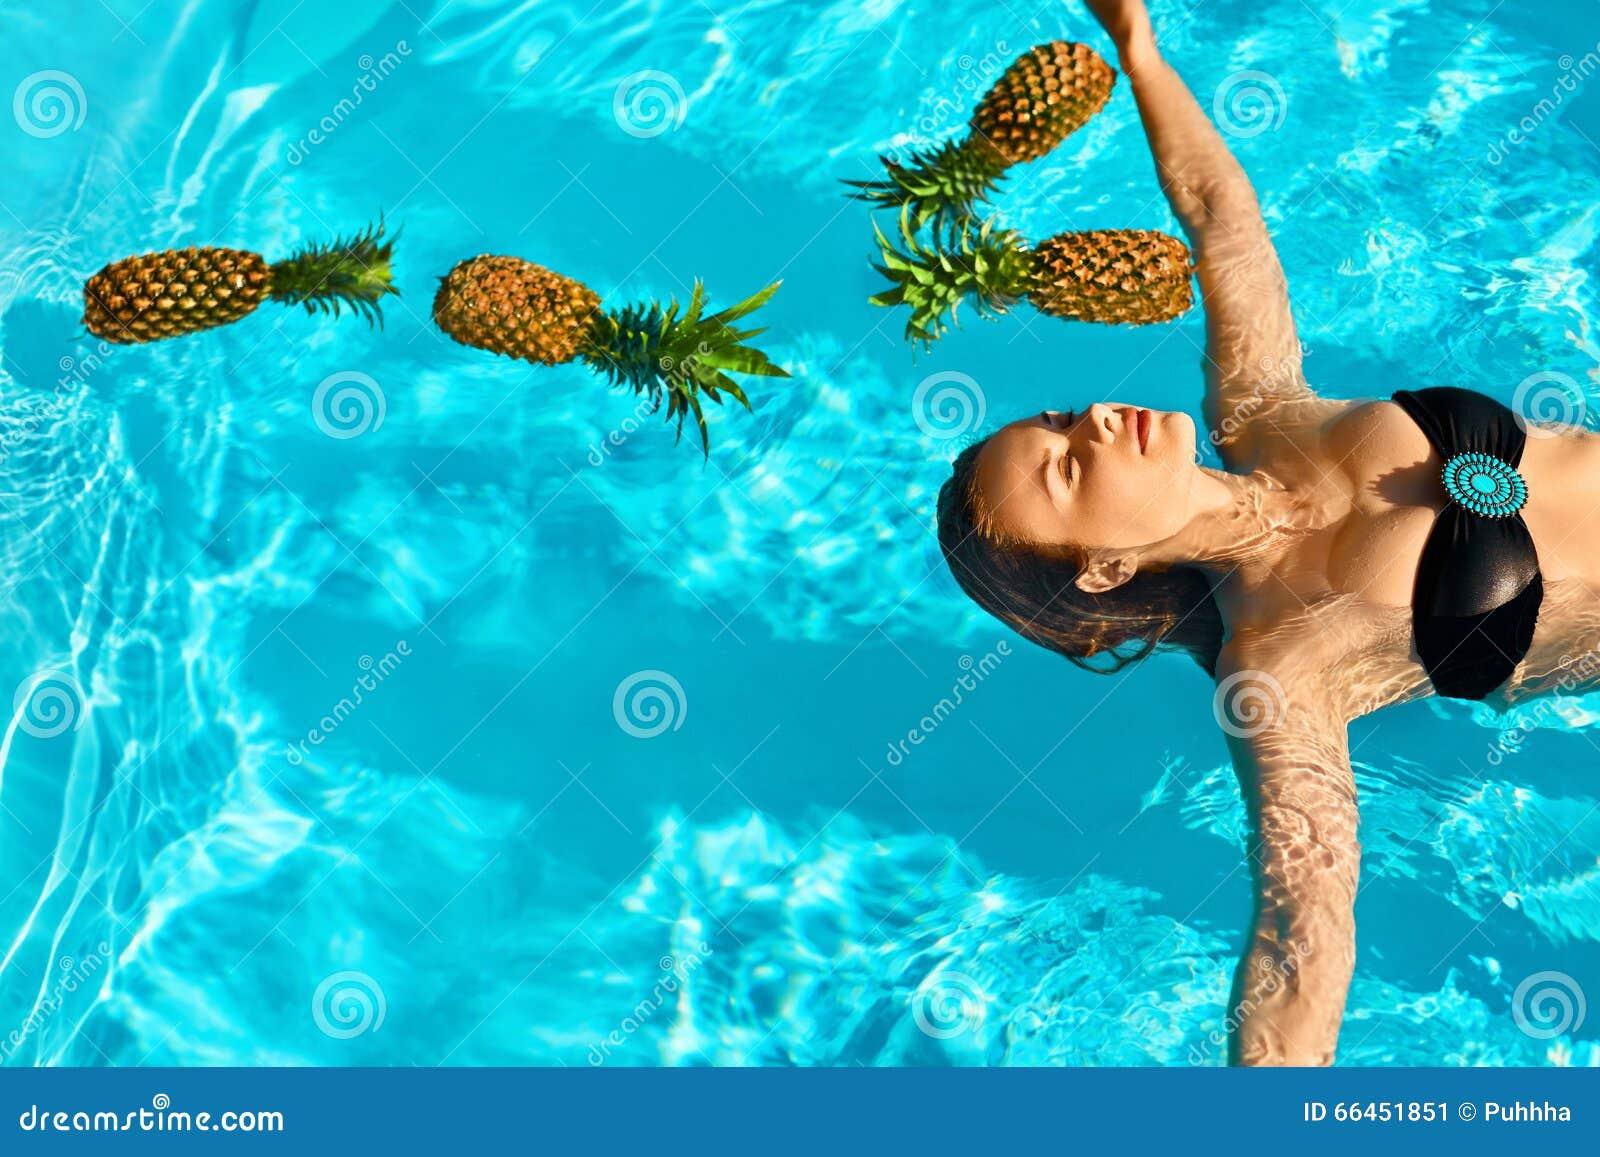 Gesunder Lebensstil, Lebensmittel Junge Frau im Pool Früchte, Vitamine